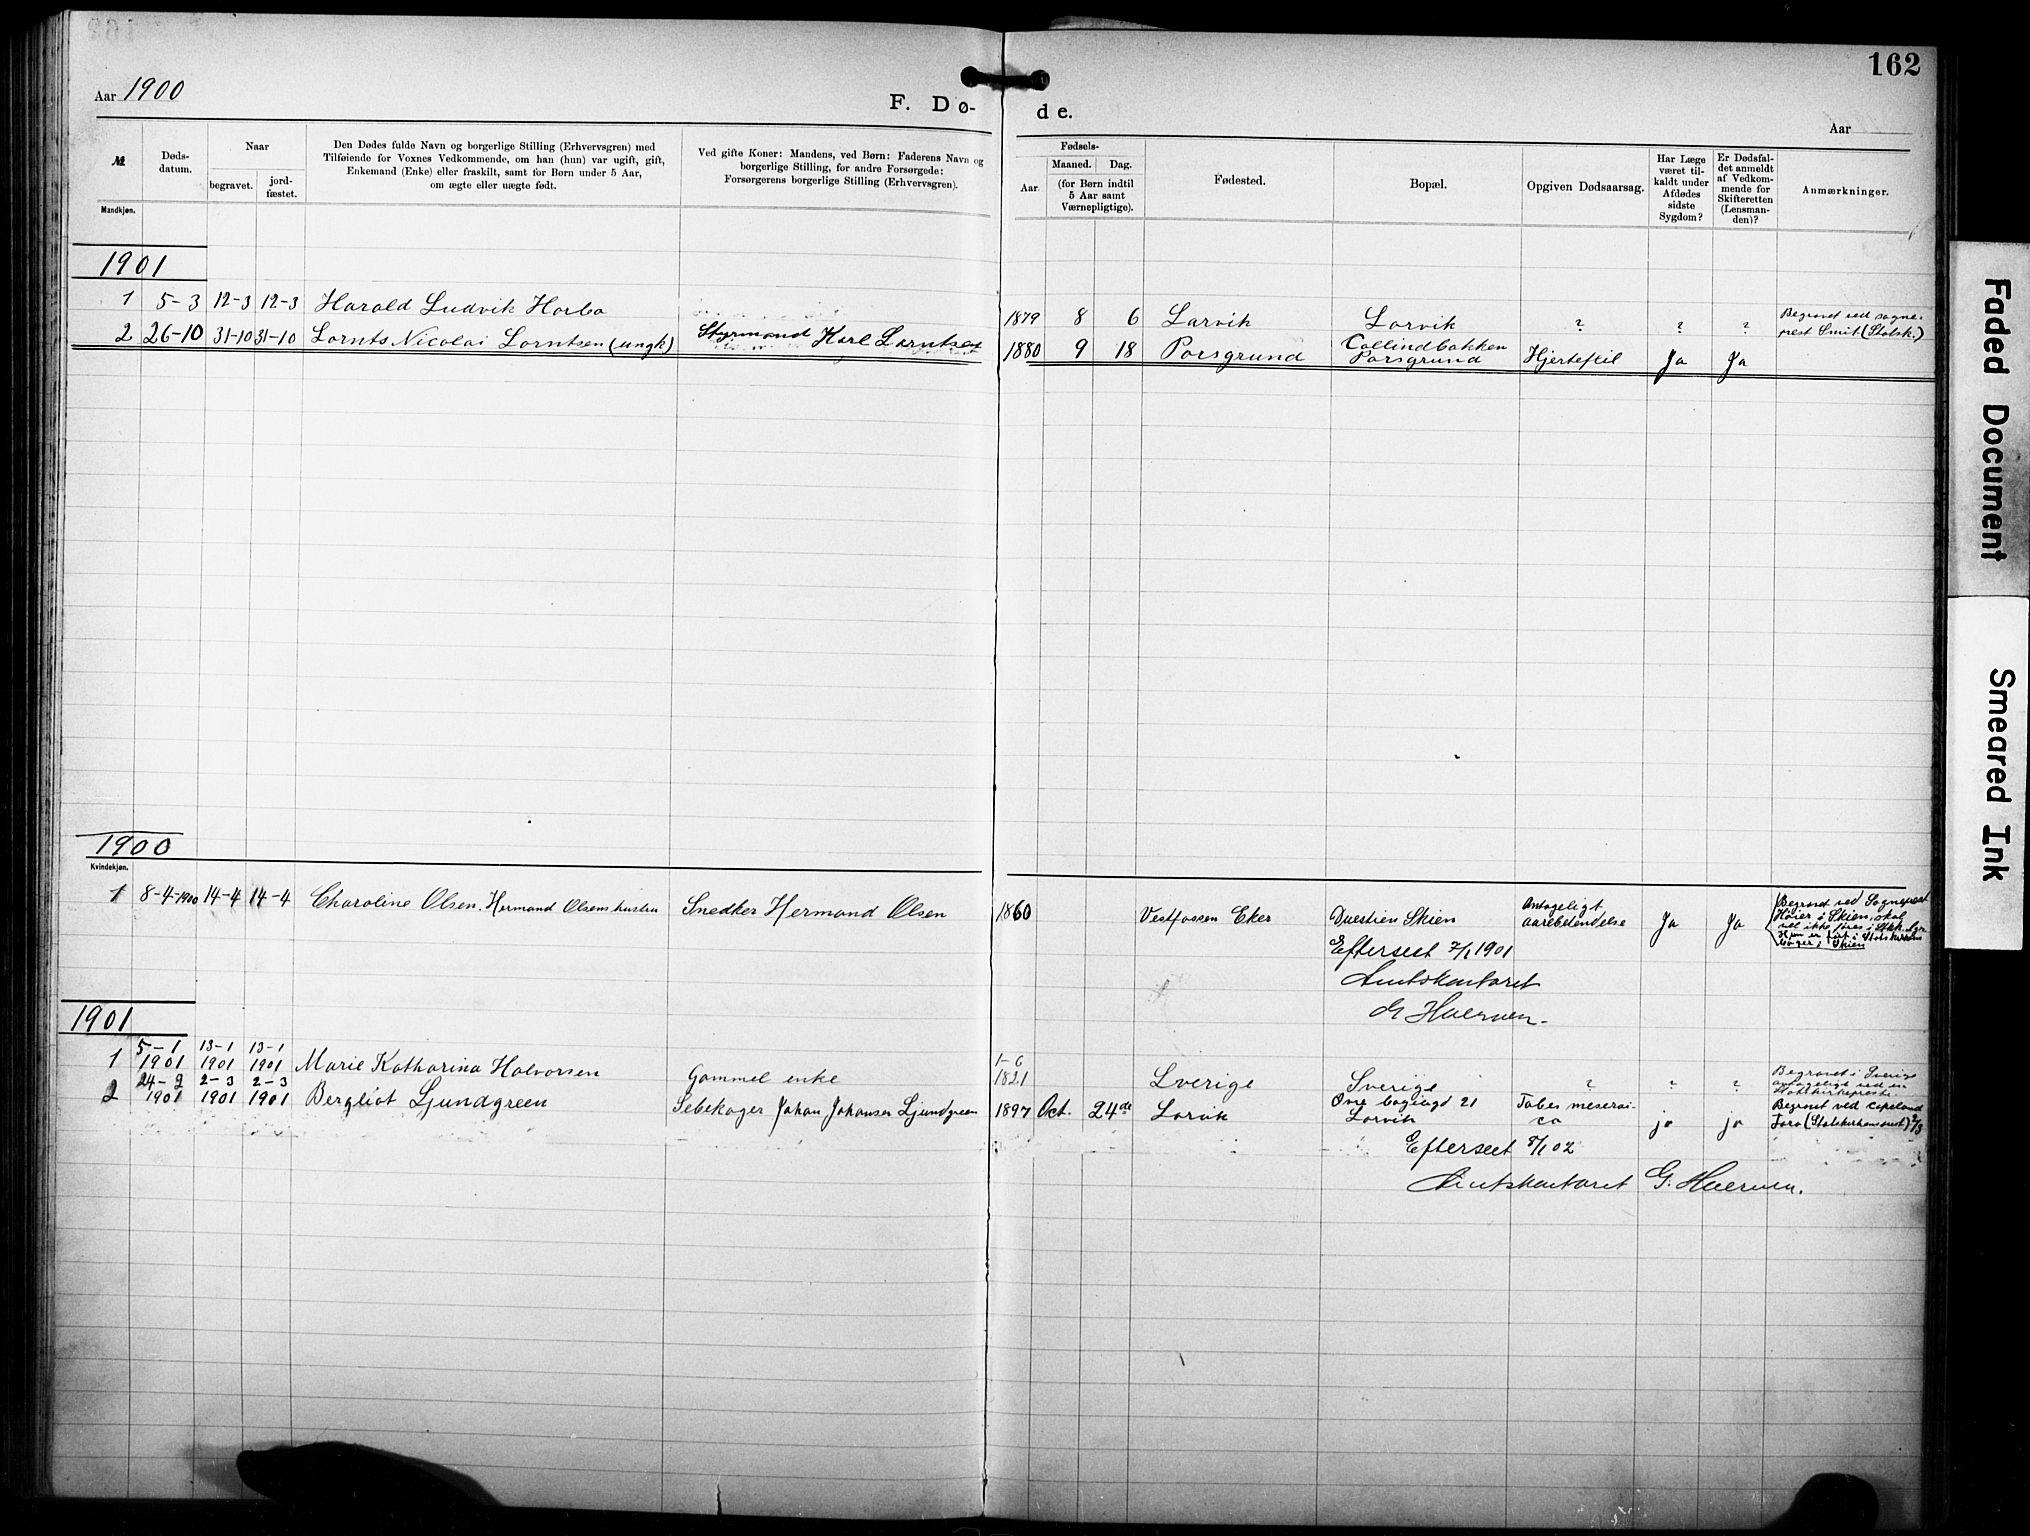 SAKO, Den katolsk-apostoliske menighet i Larvik, F/Fa/L0001: Dissenter register no. 1, 1892-1933, p. 162